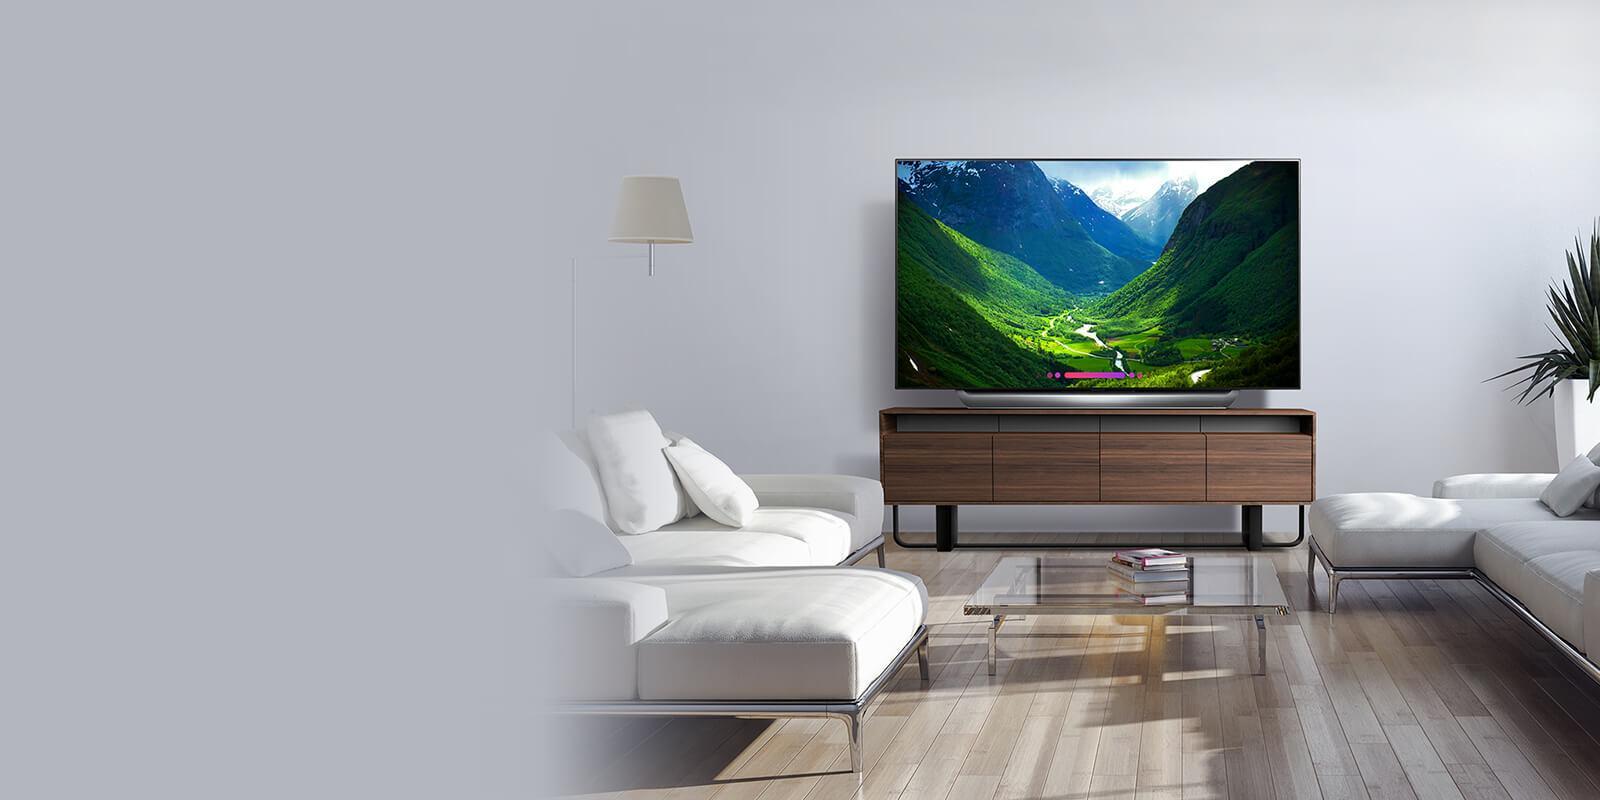 LG OLED TVs: AI, Wallpaper, Curved, Flat & 4K OLED TVs